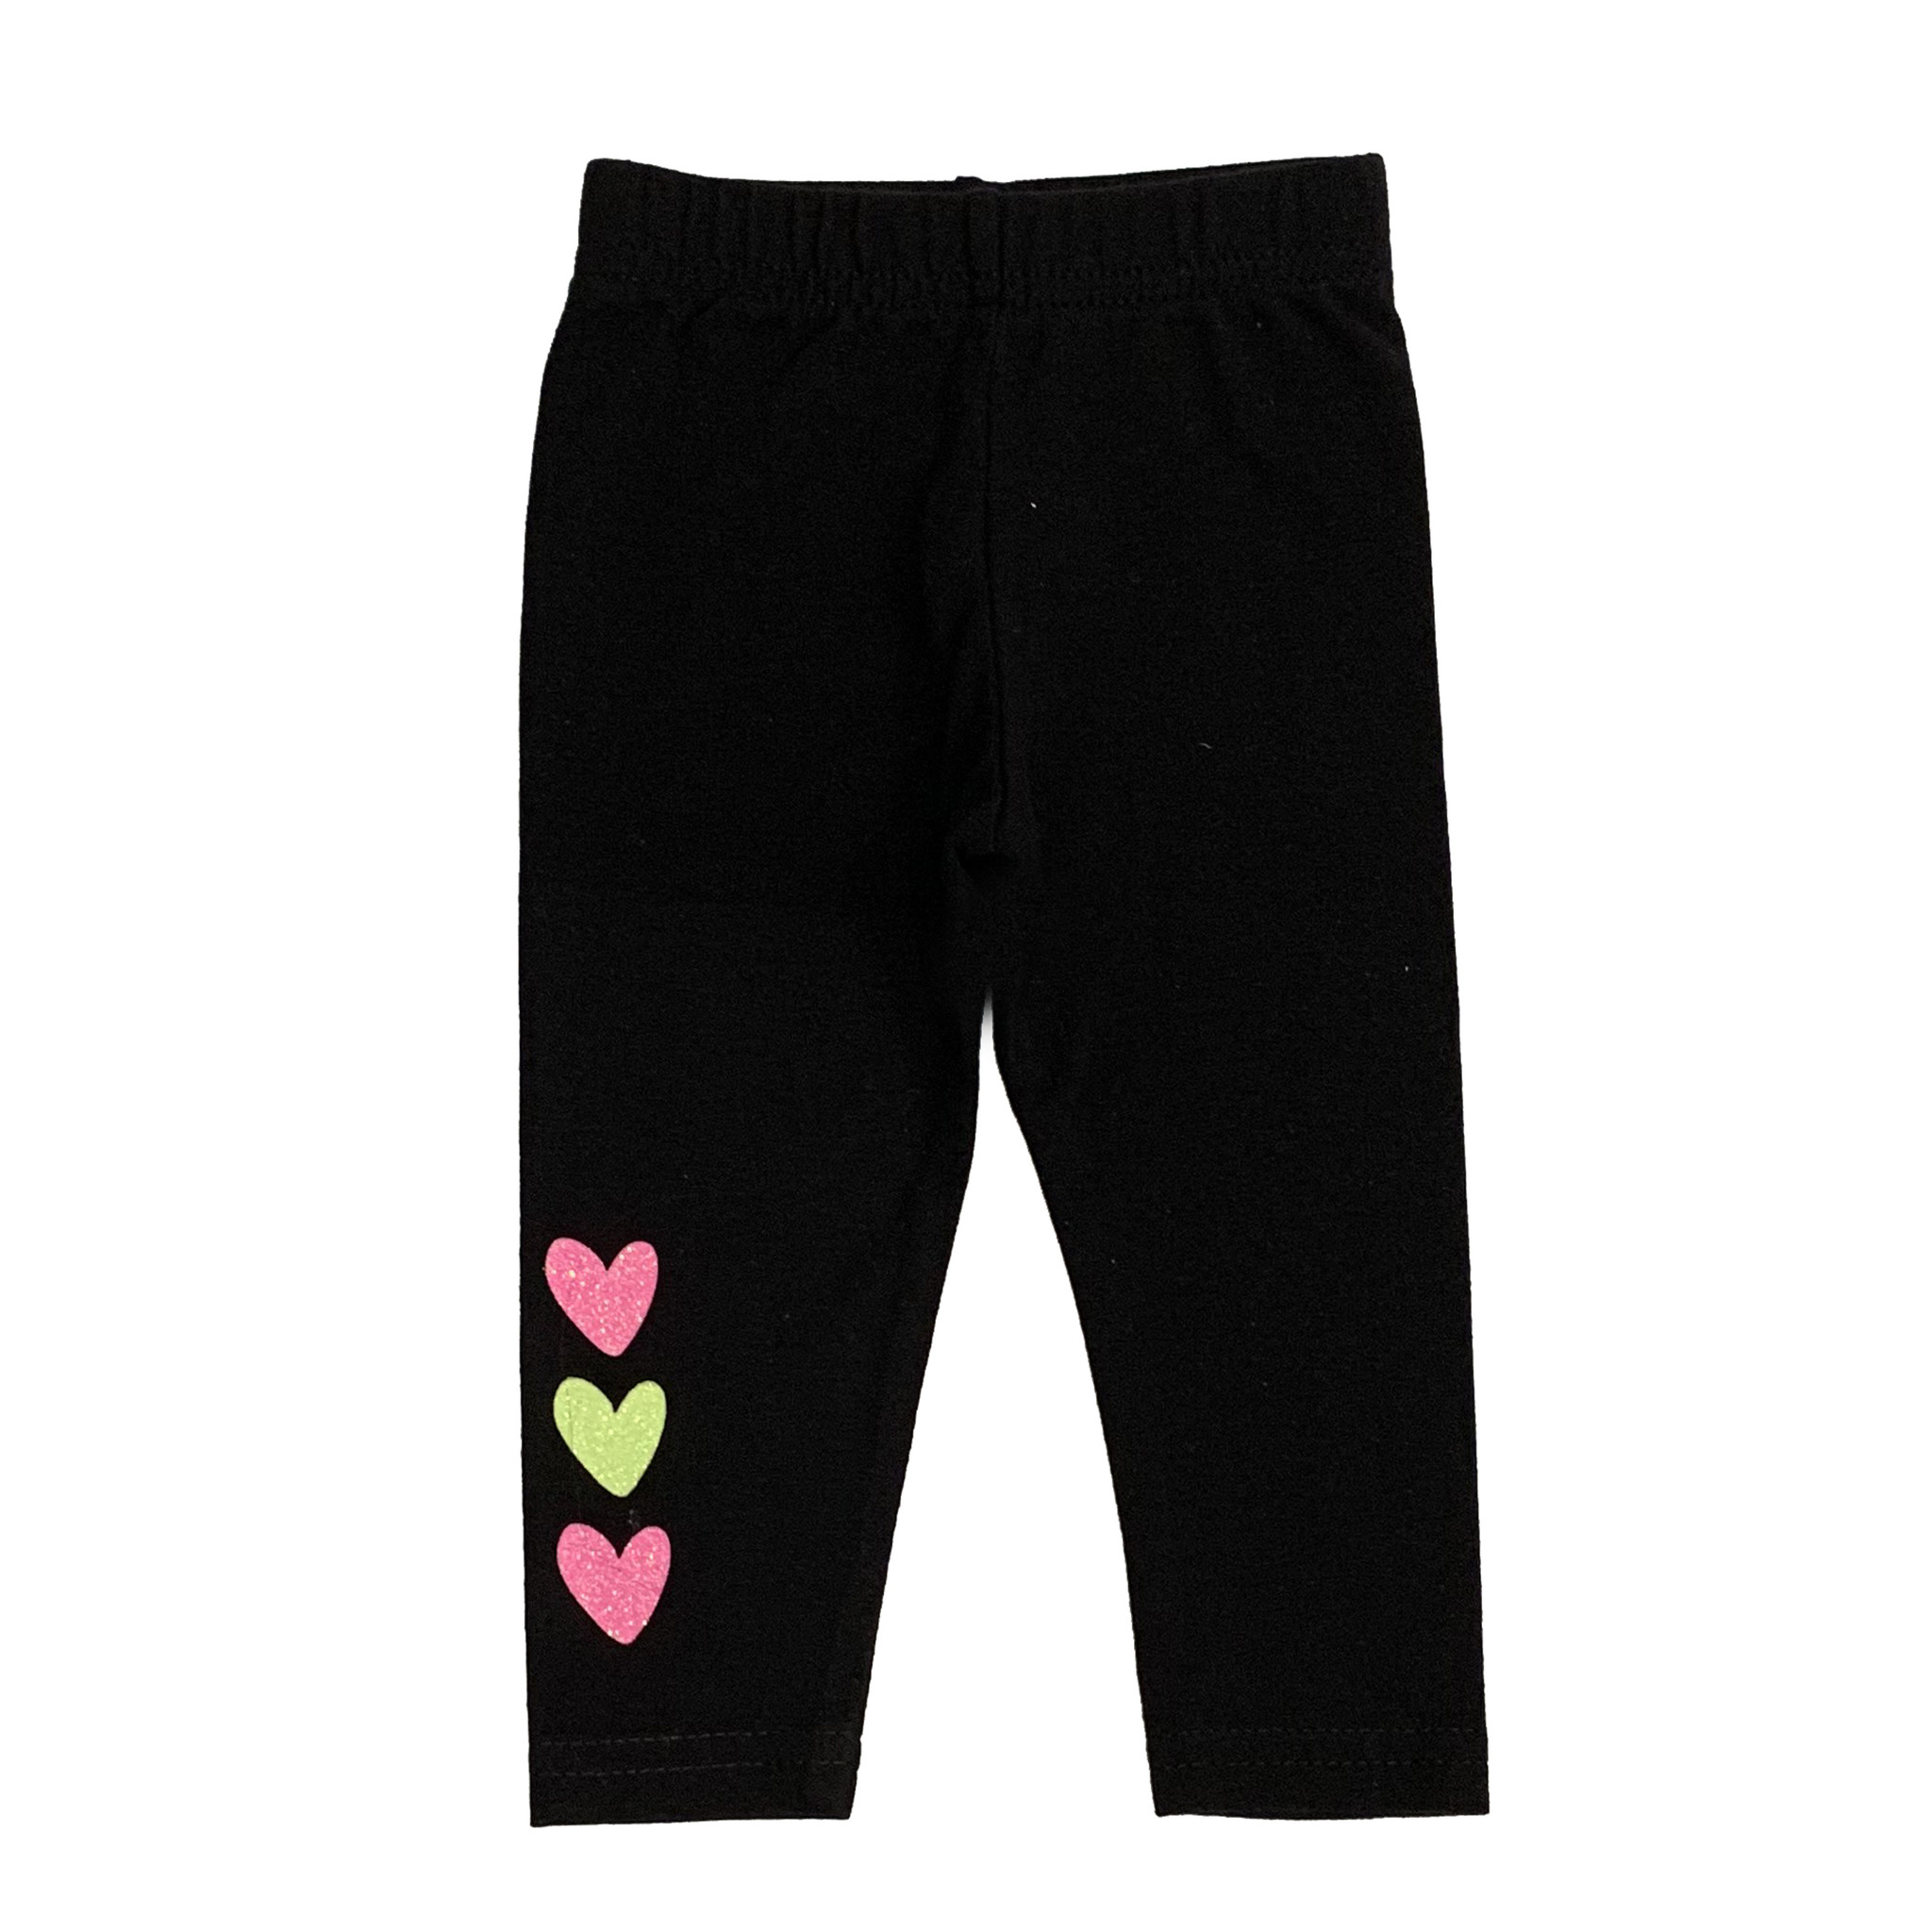 Small Change Neon Hearts Leggings